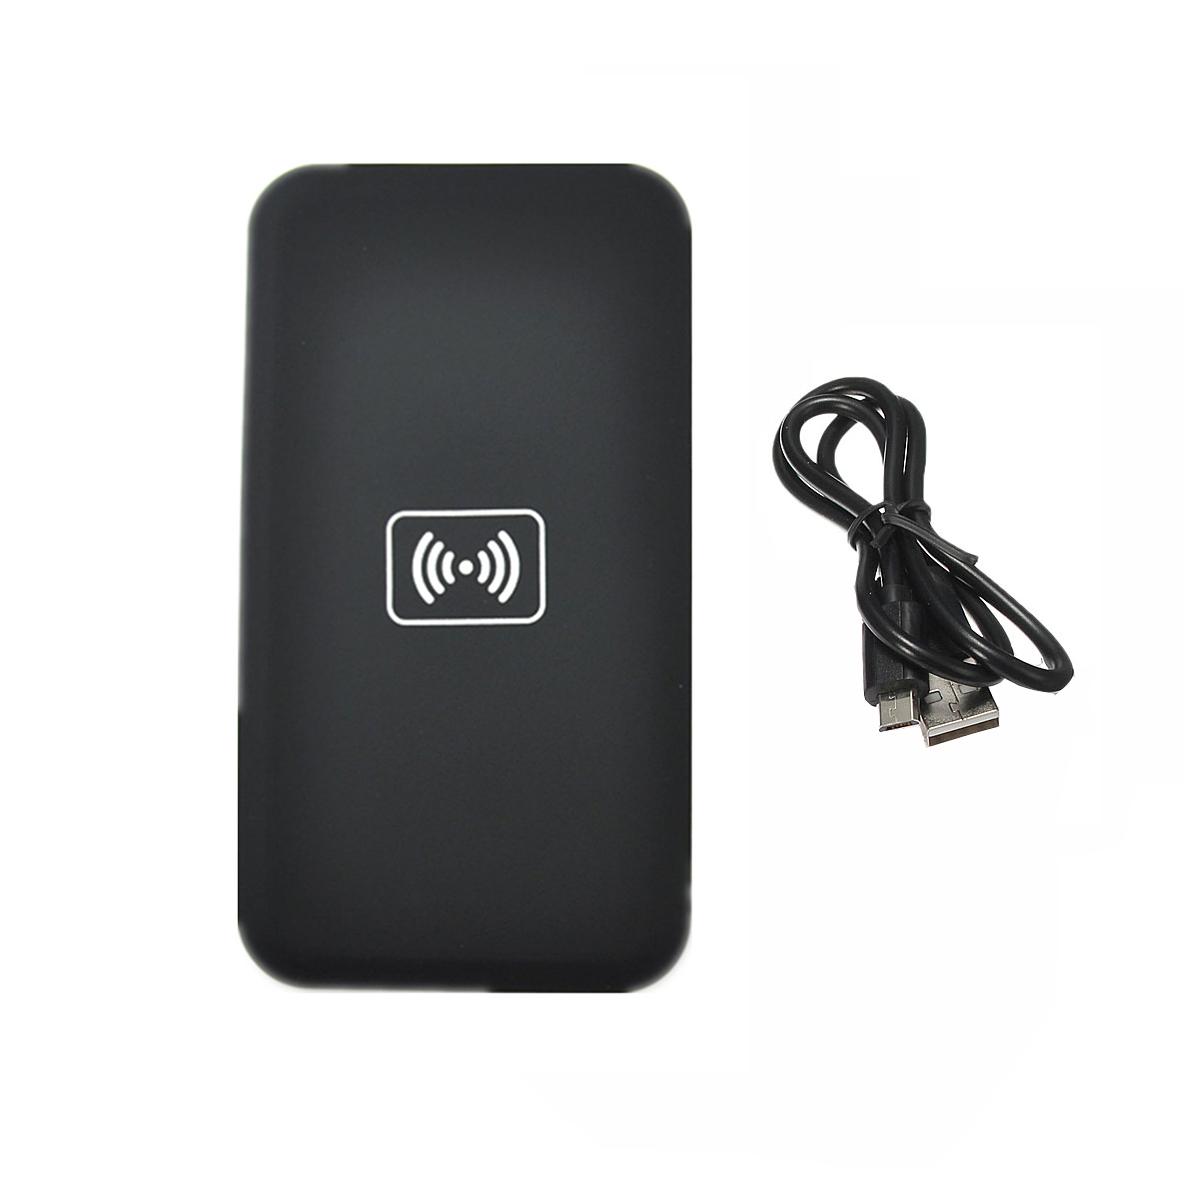 Qi Wireless Charging Charger Pad for iPhone Samsung Nexus LG HTC Mircosoft Nokia